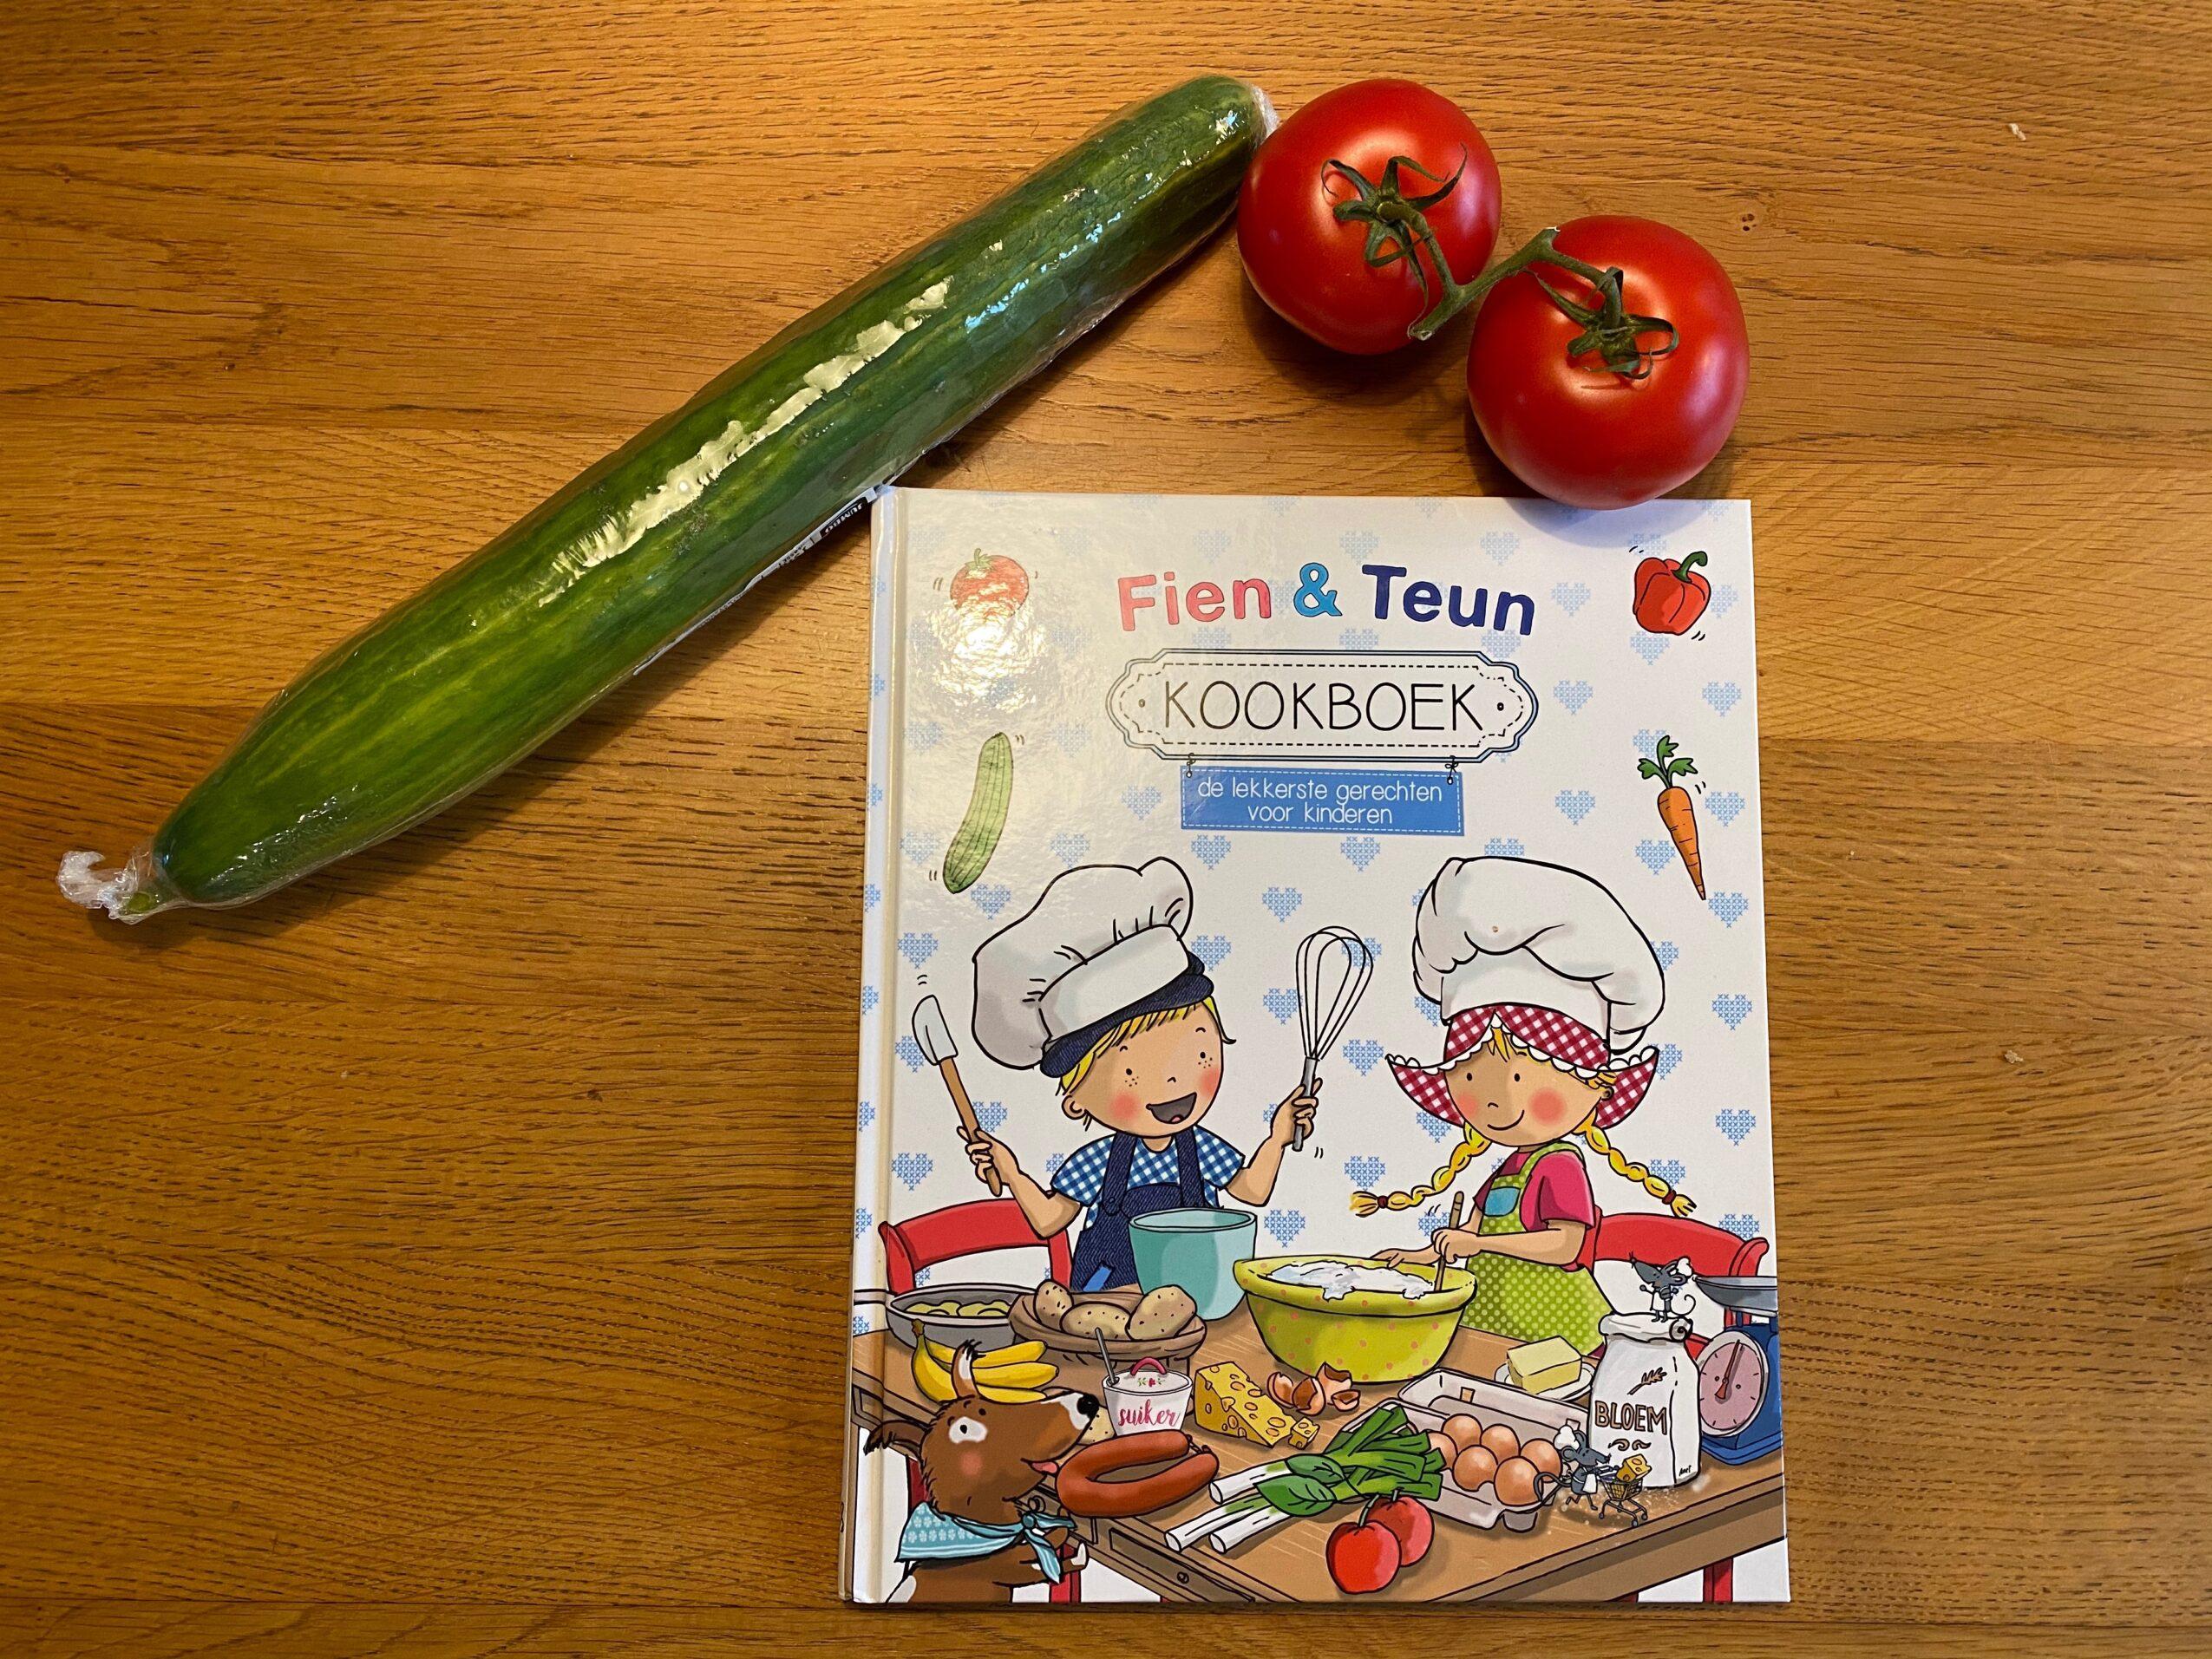 Fien & Teun kookboek WIN